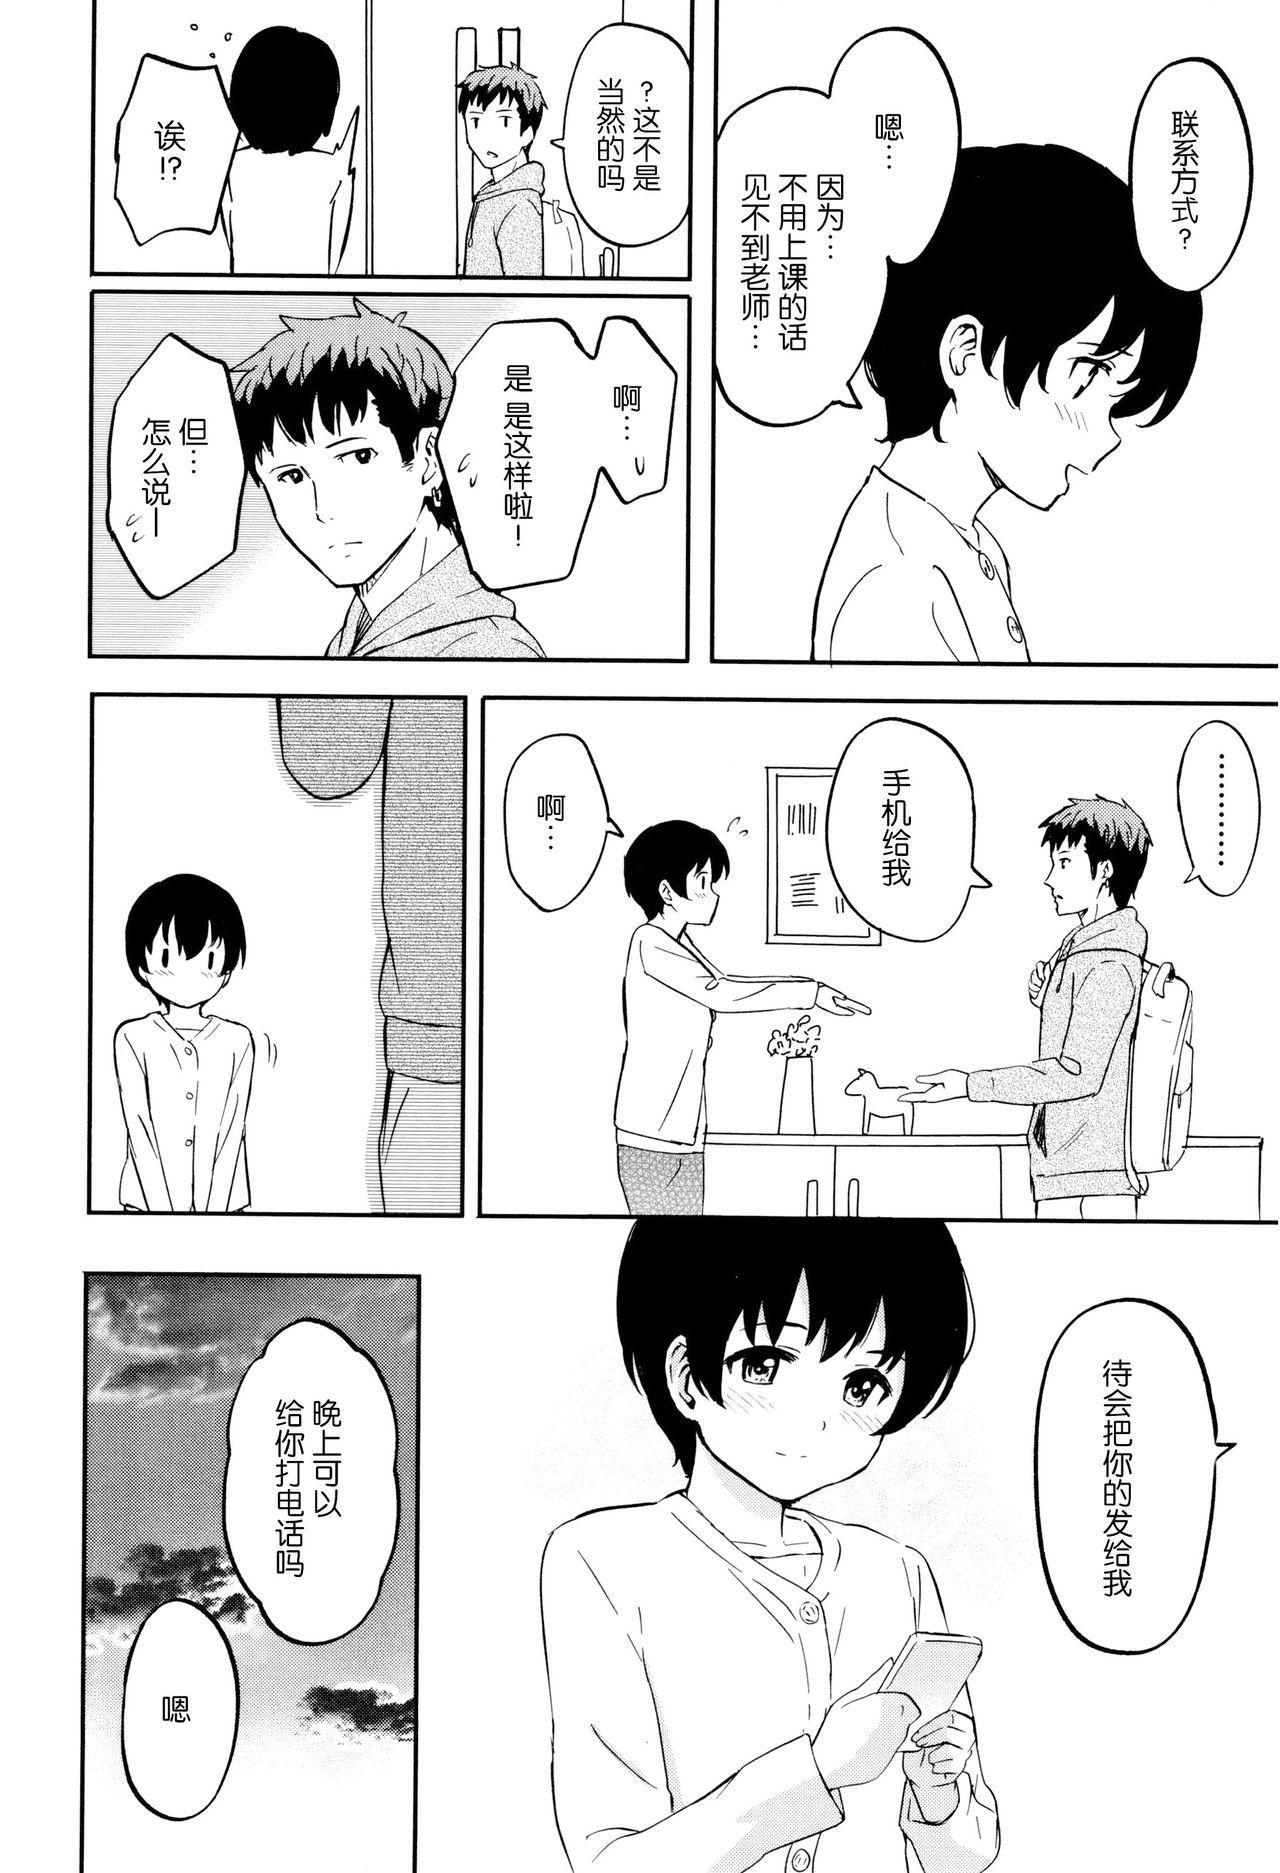 Tokubetsu na Mainichi - Special daily 140